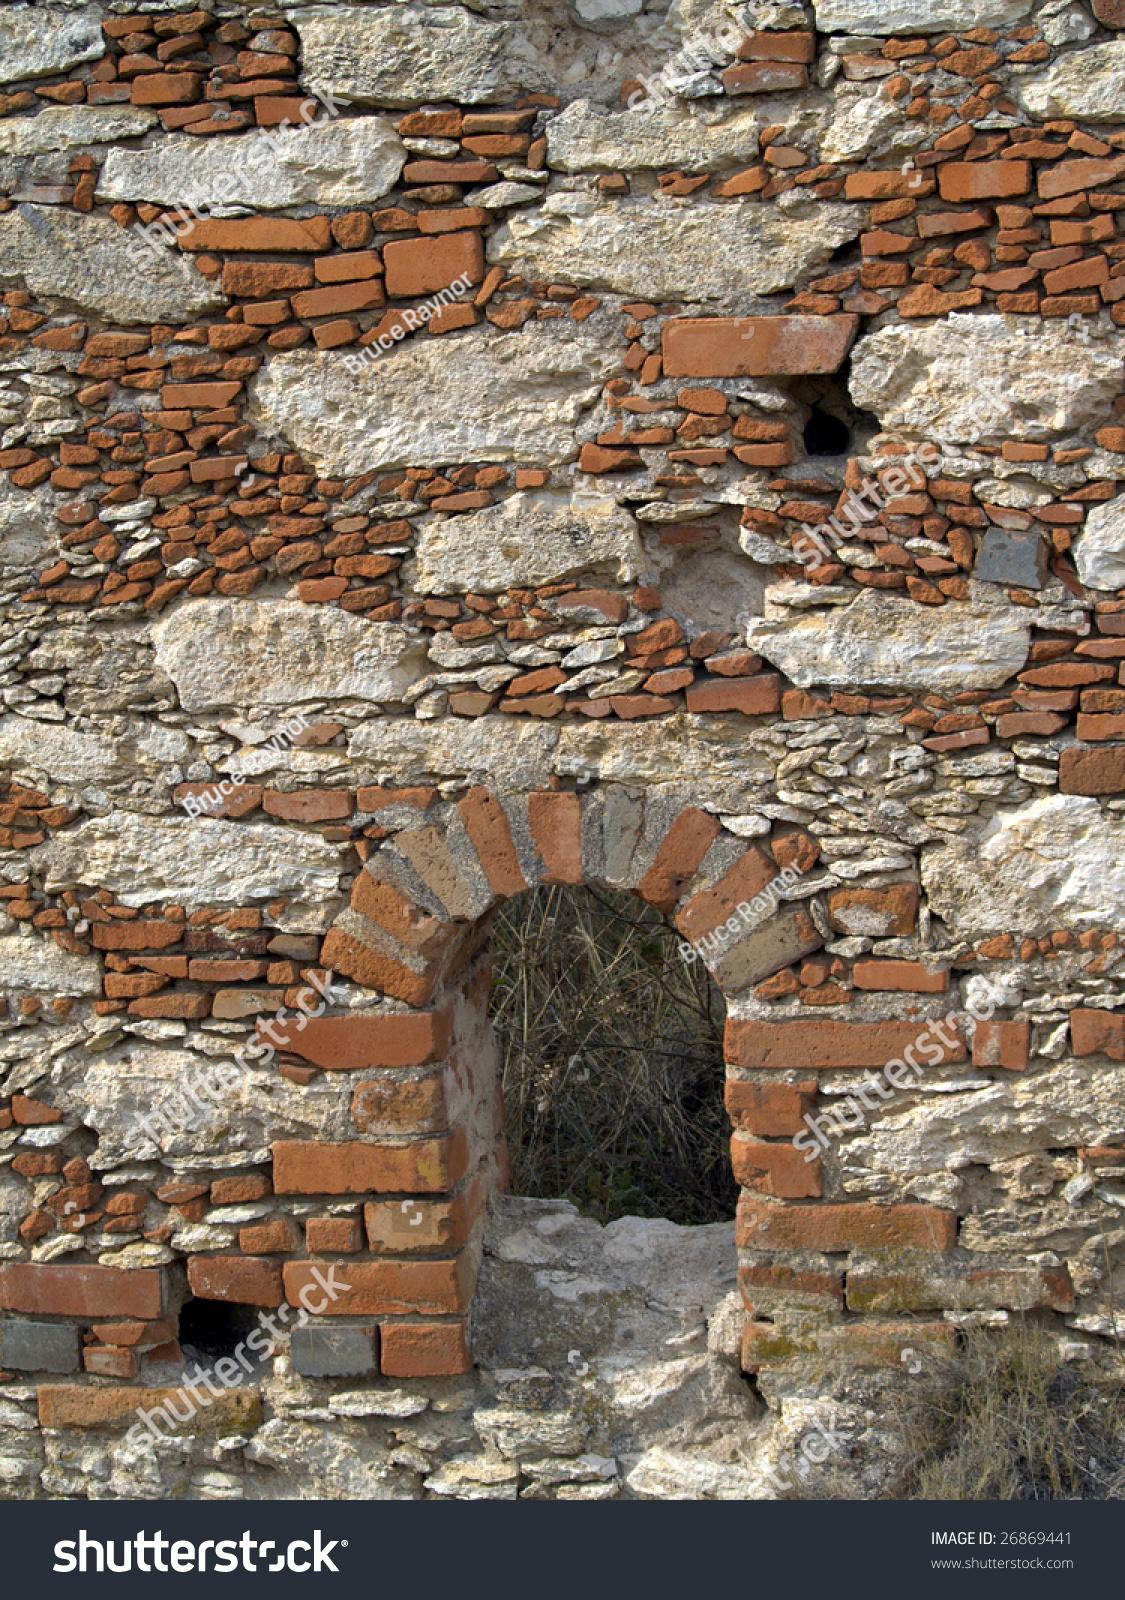 Brick stone wall portal ruins pozos stock photo 26869441 for American brick and stone